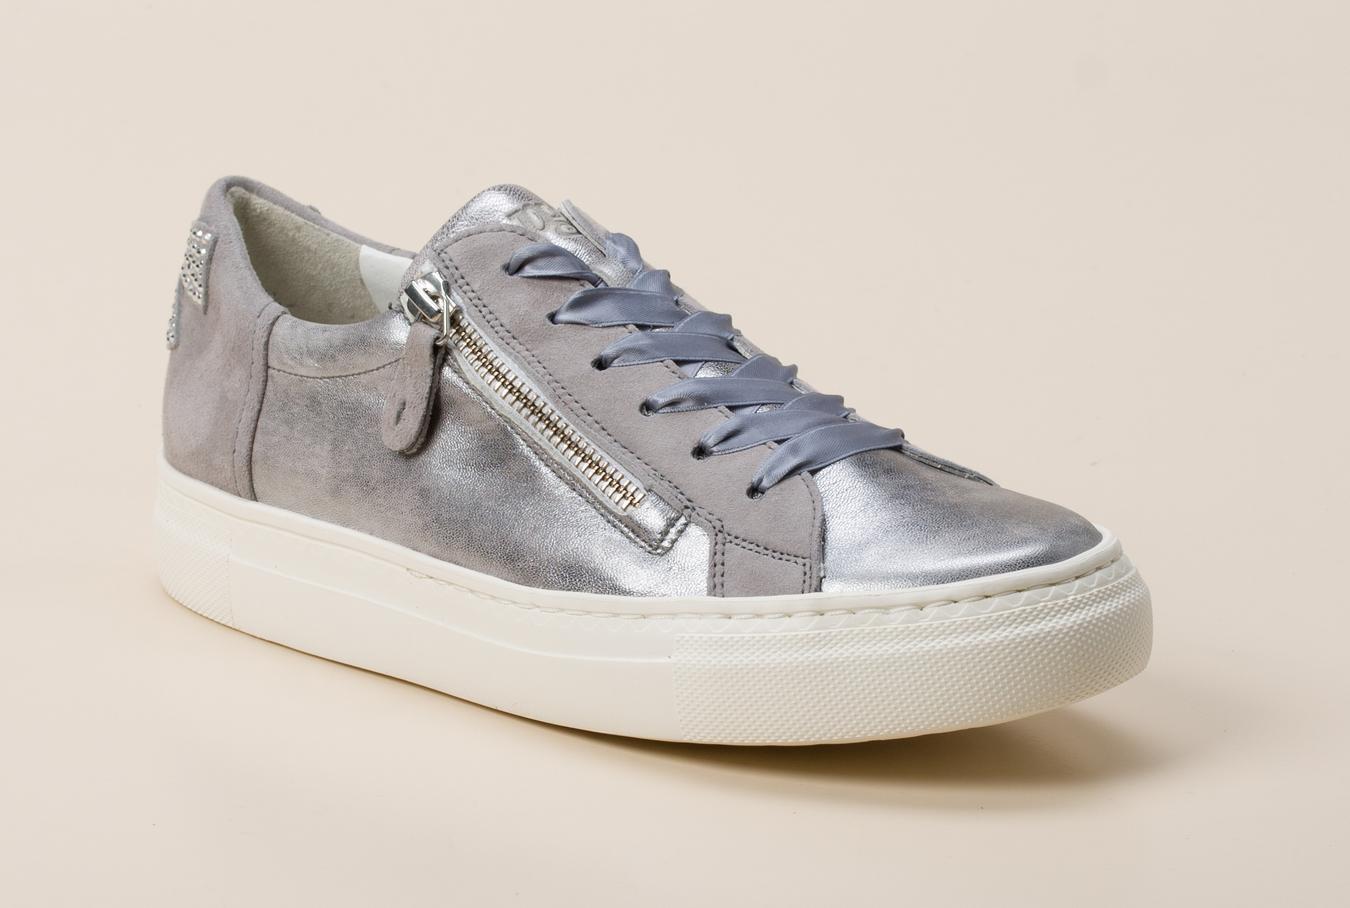 new style b4892 d0ade Paul Green Damen Sneaker in silber kaufen   Zumnorde Online-Shop